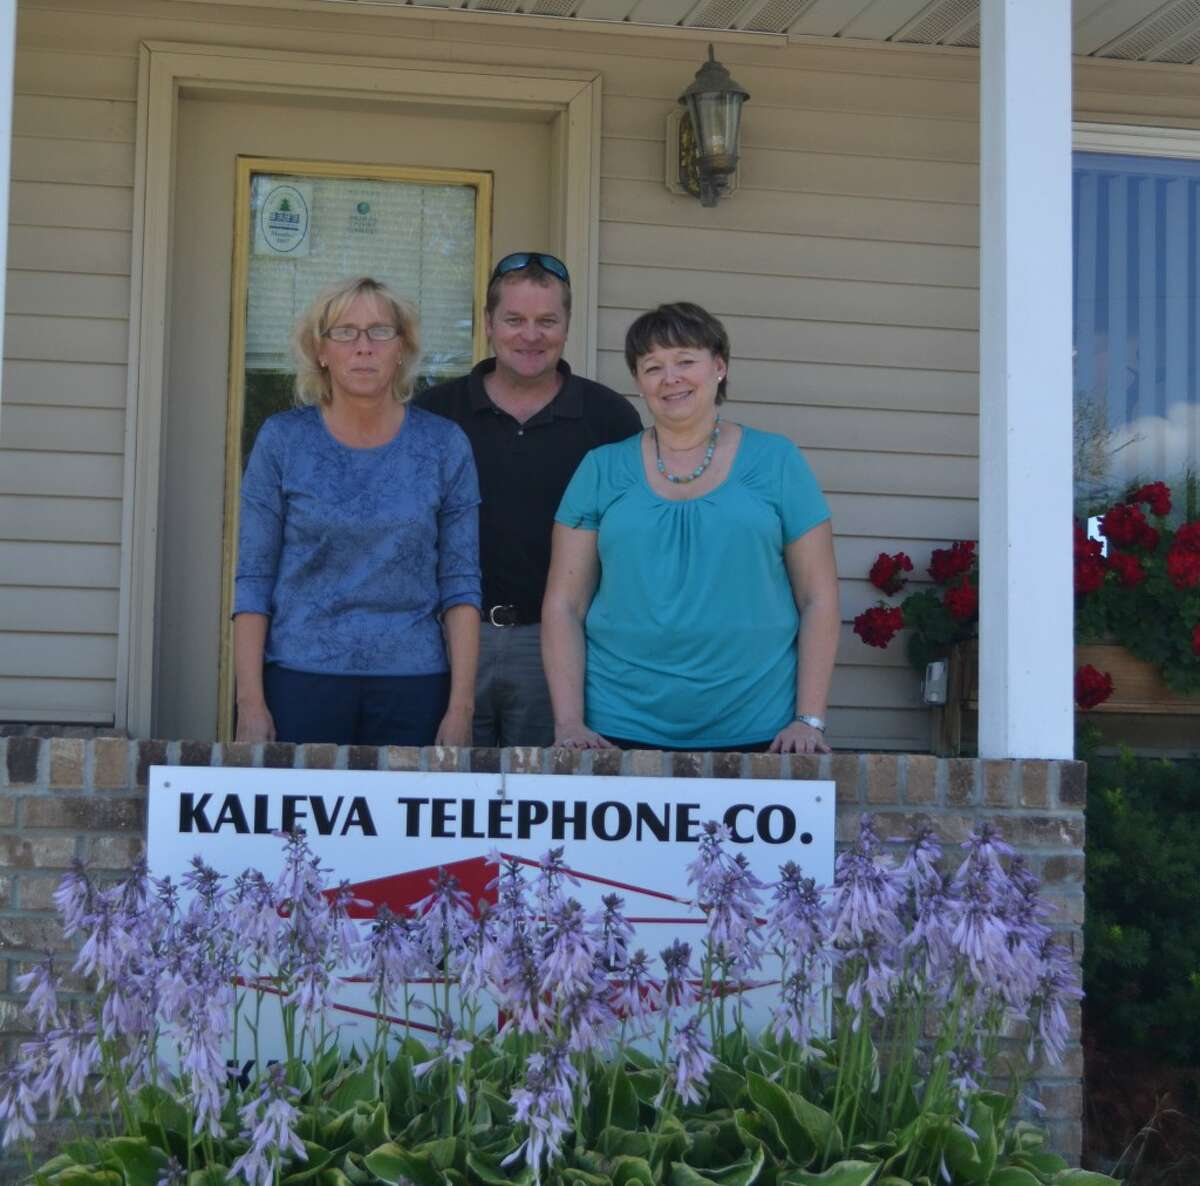 Three of the Kaleva Telephone Company's 11 employees are (FROM LEFT) Bonnie Lindeman, John Cribbs Jr. and Deborah Maxey. (Meg LeDuc/News Advocate)